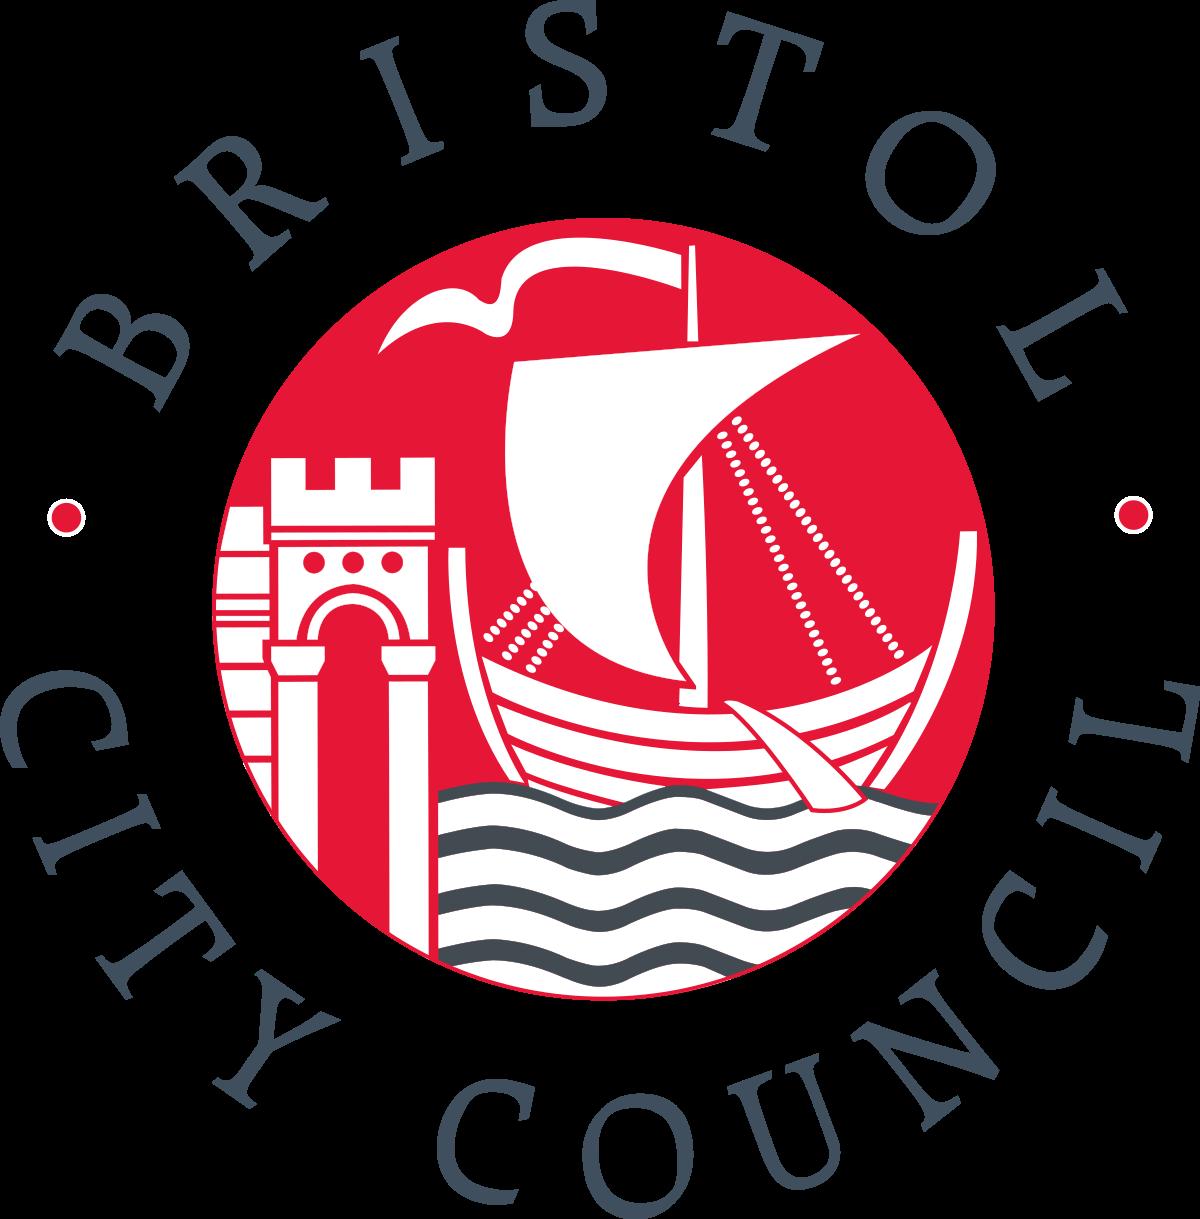 Bristol_City_Council_logo.png